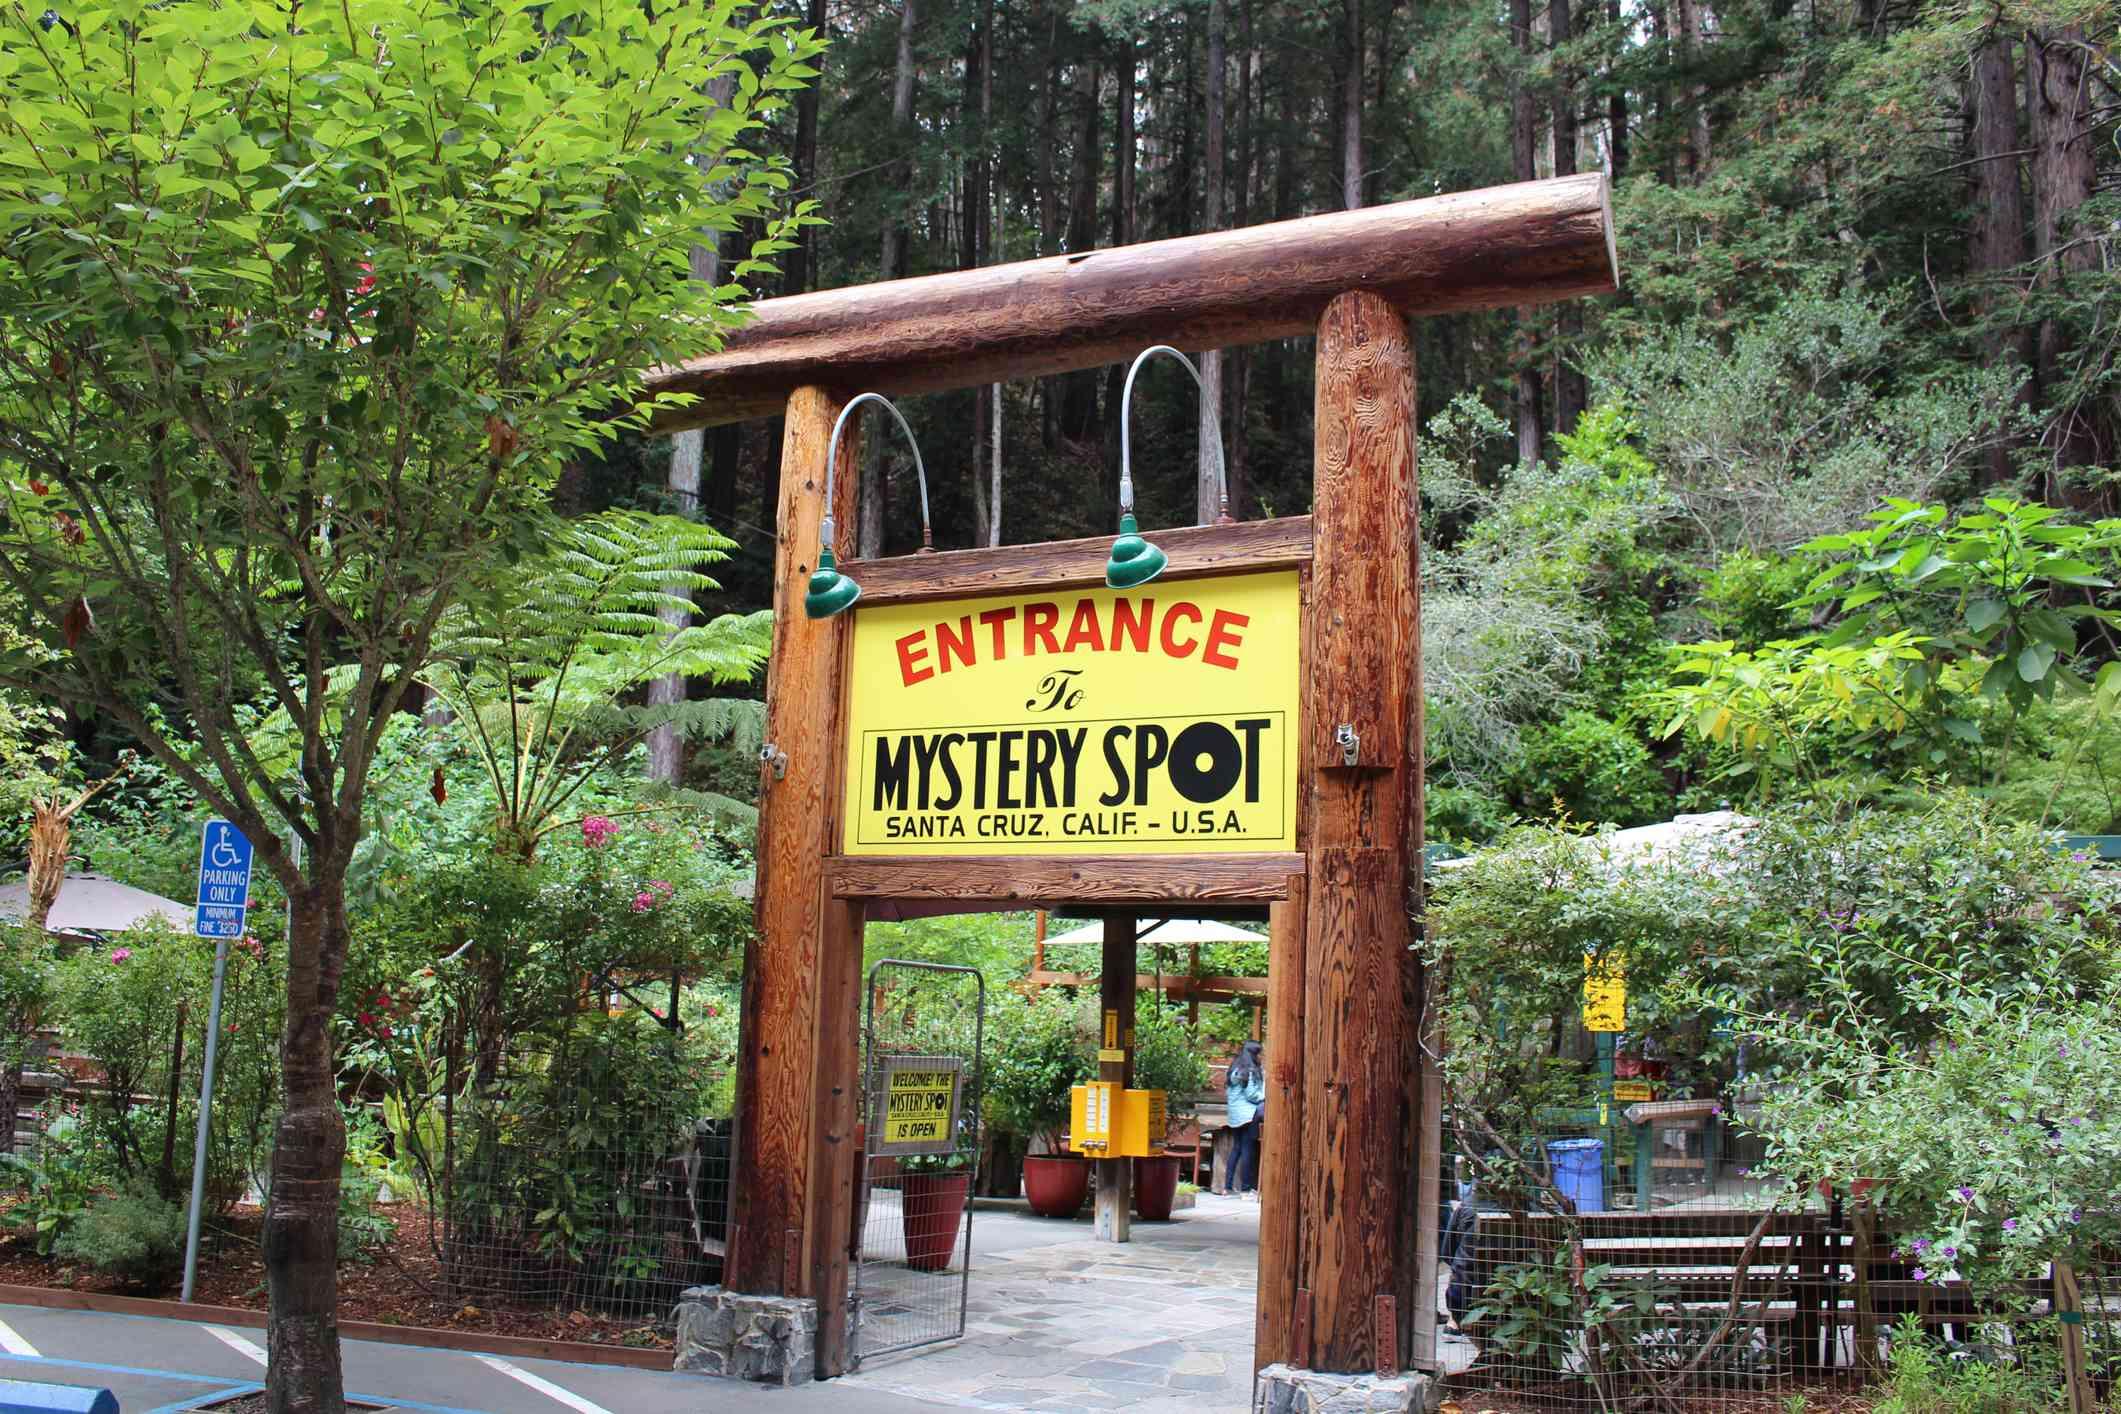 Mystery Spot entrance sign in Santa Cruz, California